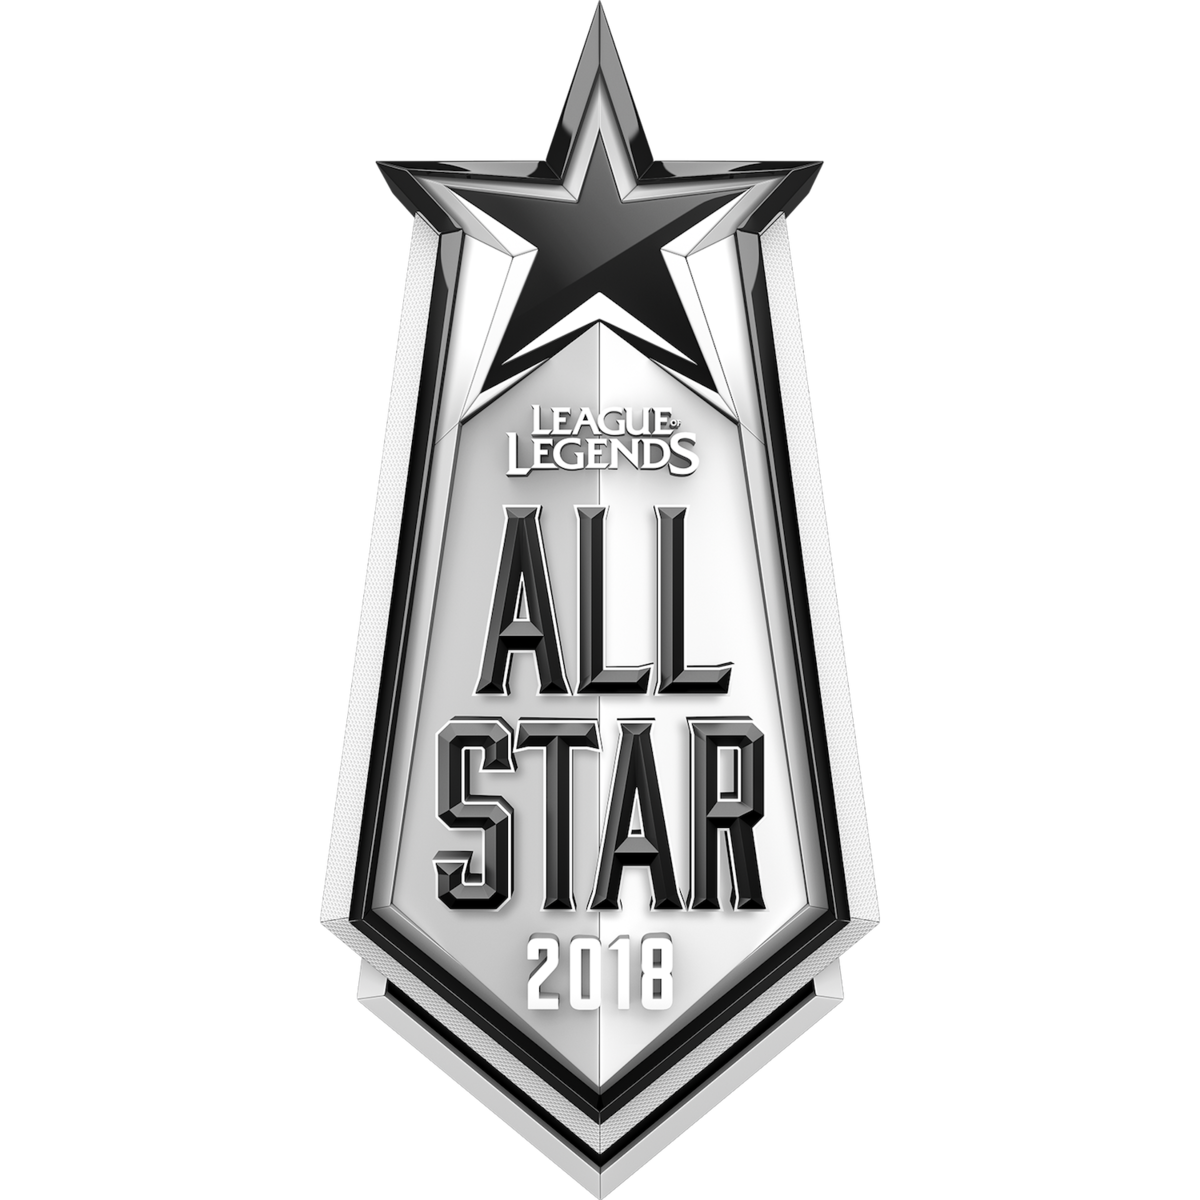 League of Legends All Star 2018